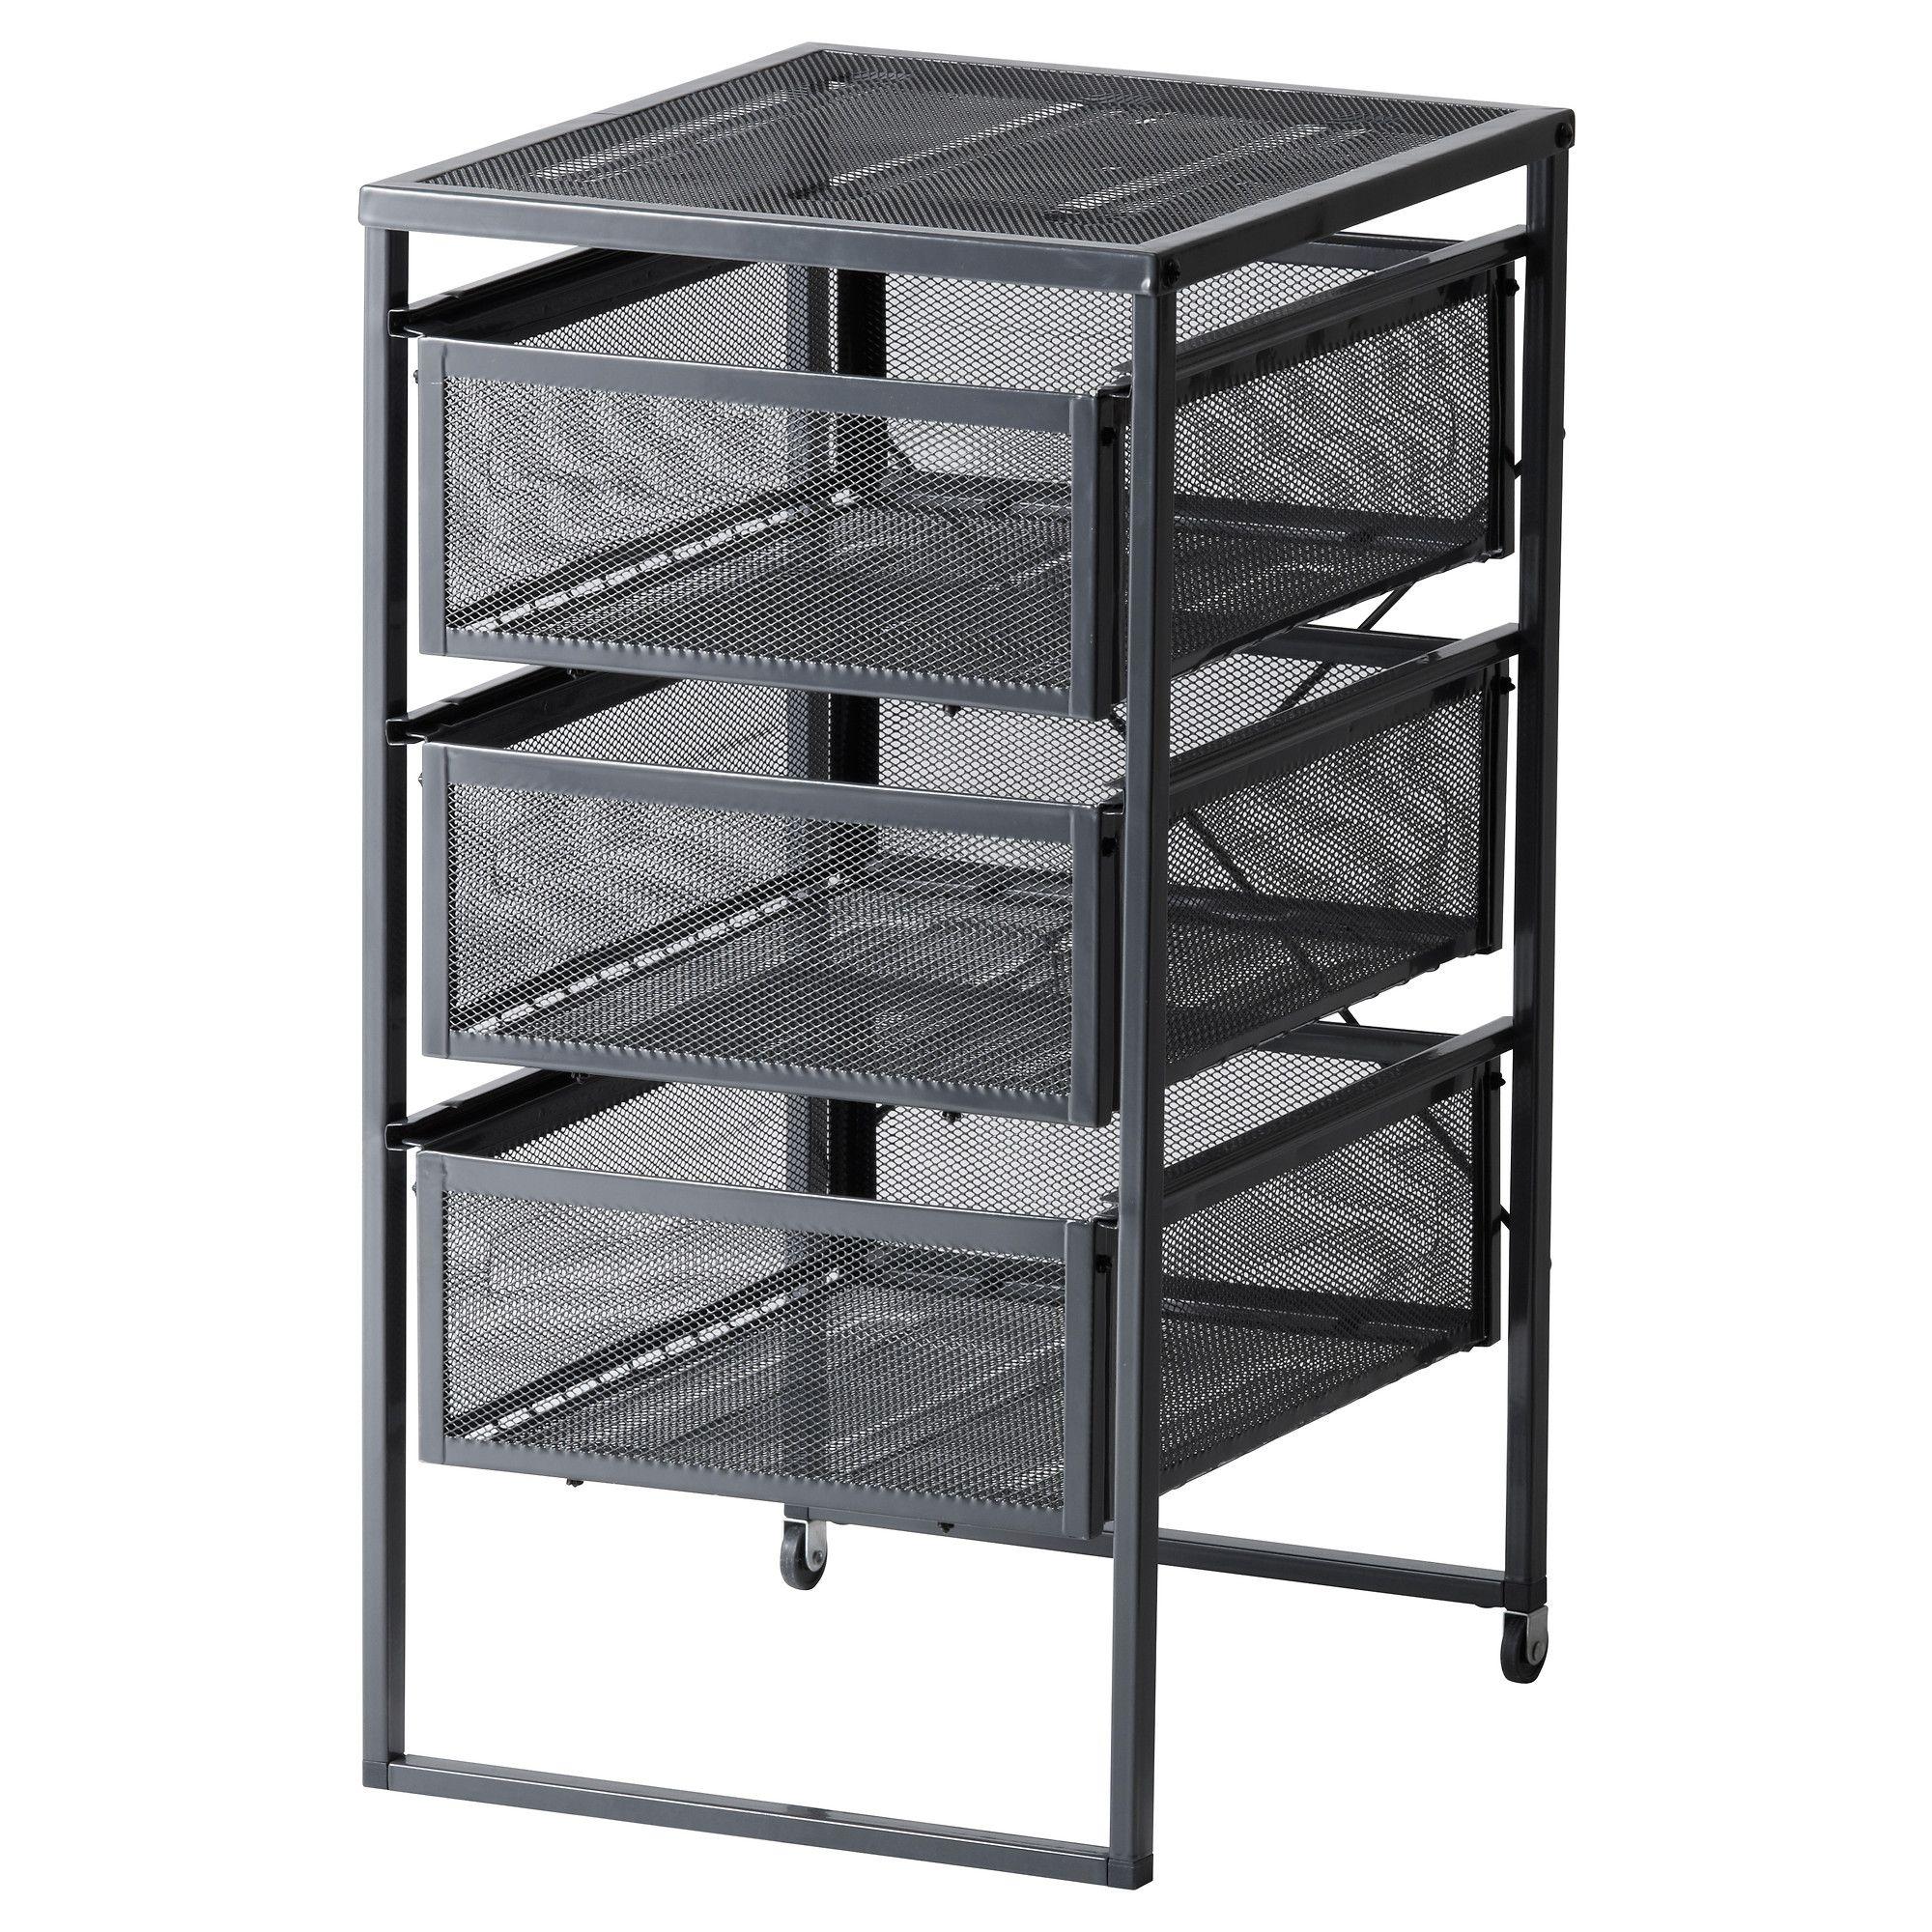 kitchen drawer organizer ikea light fixtures flush mount lennart unit repurpose for under cabinet